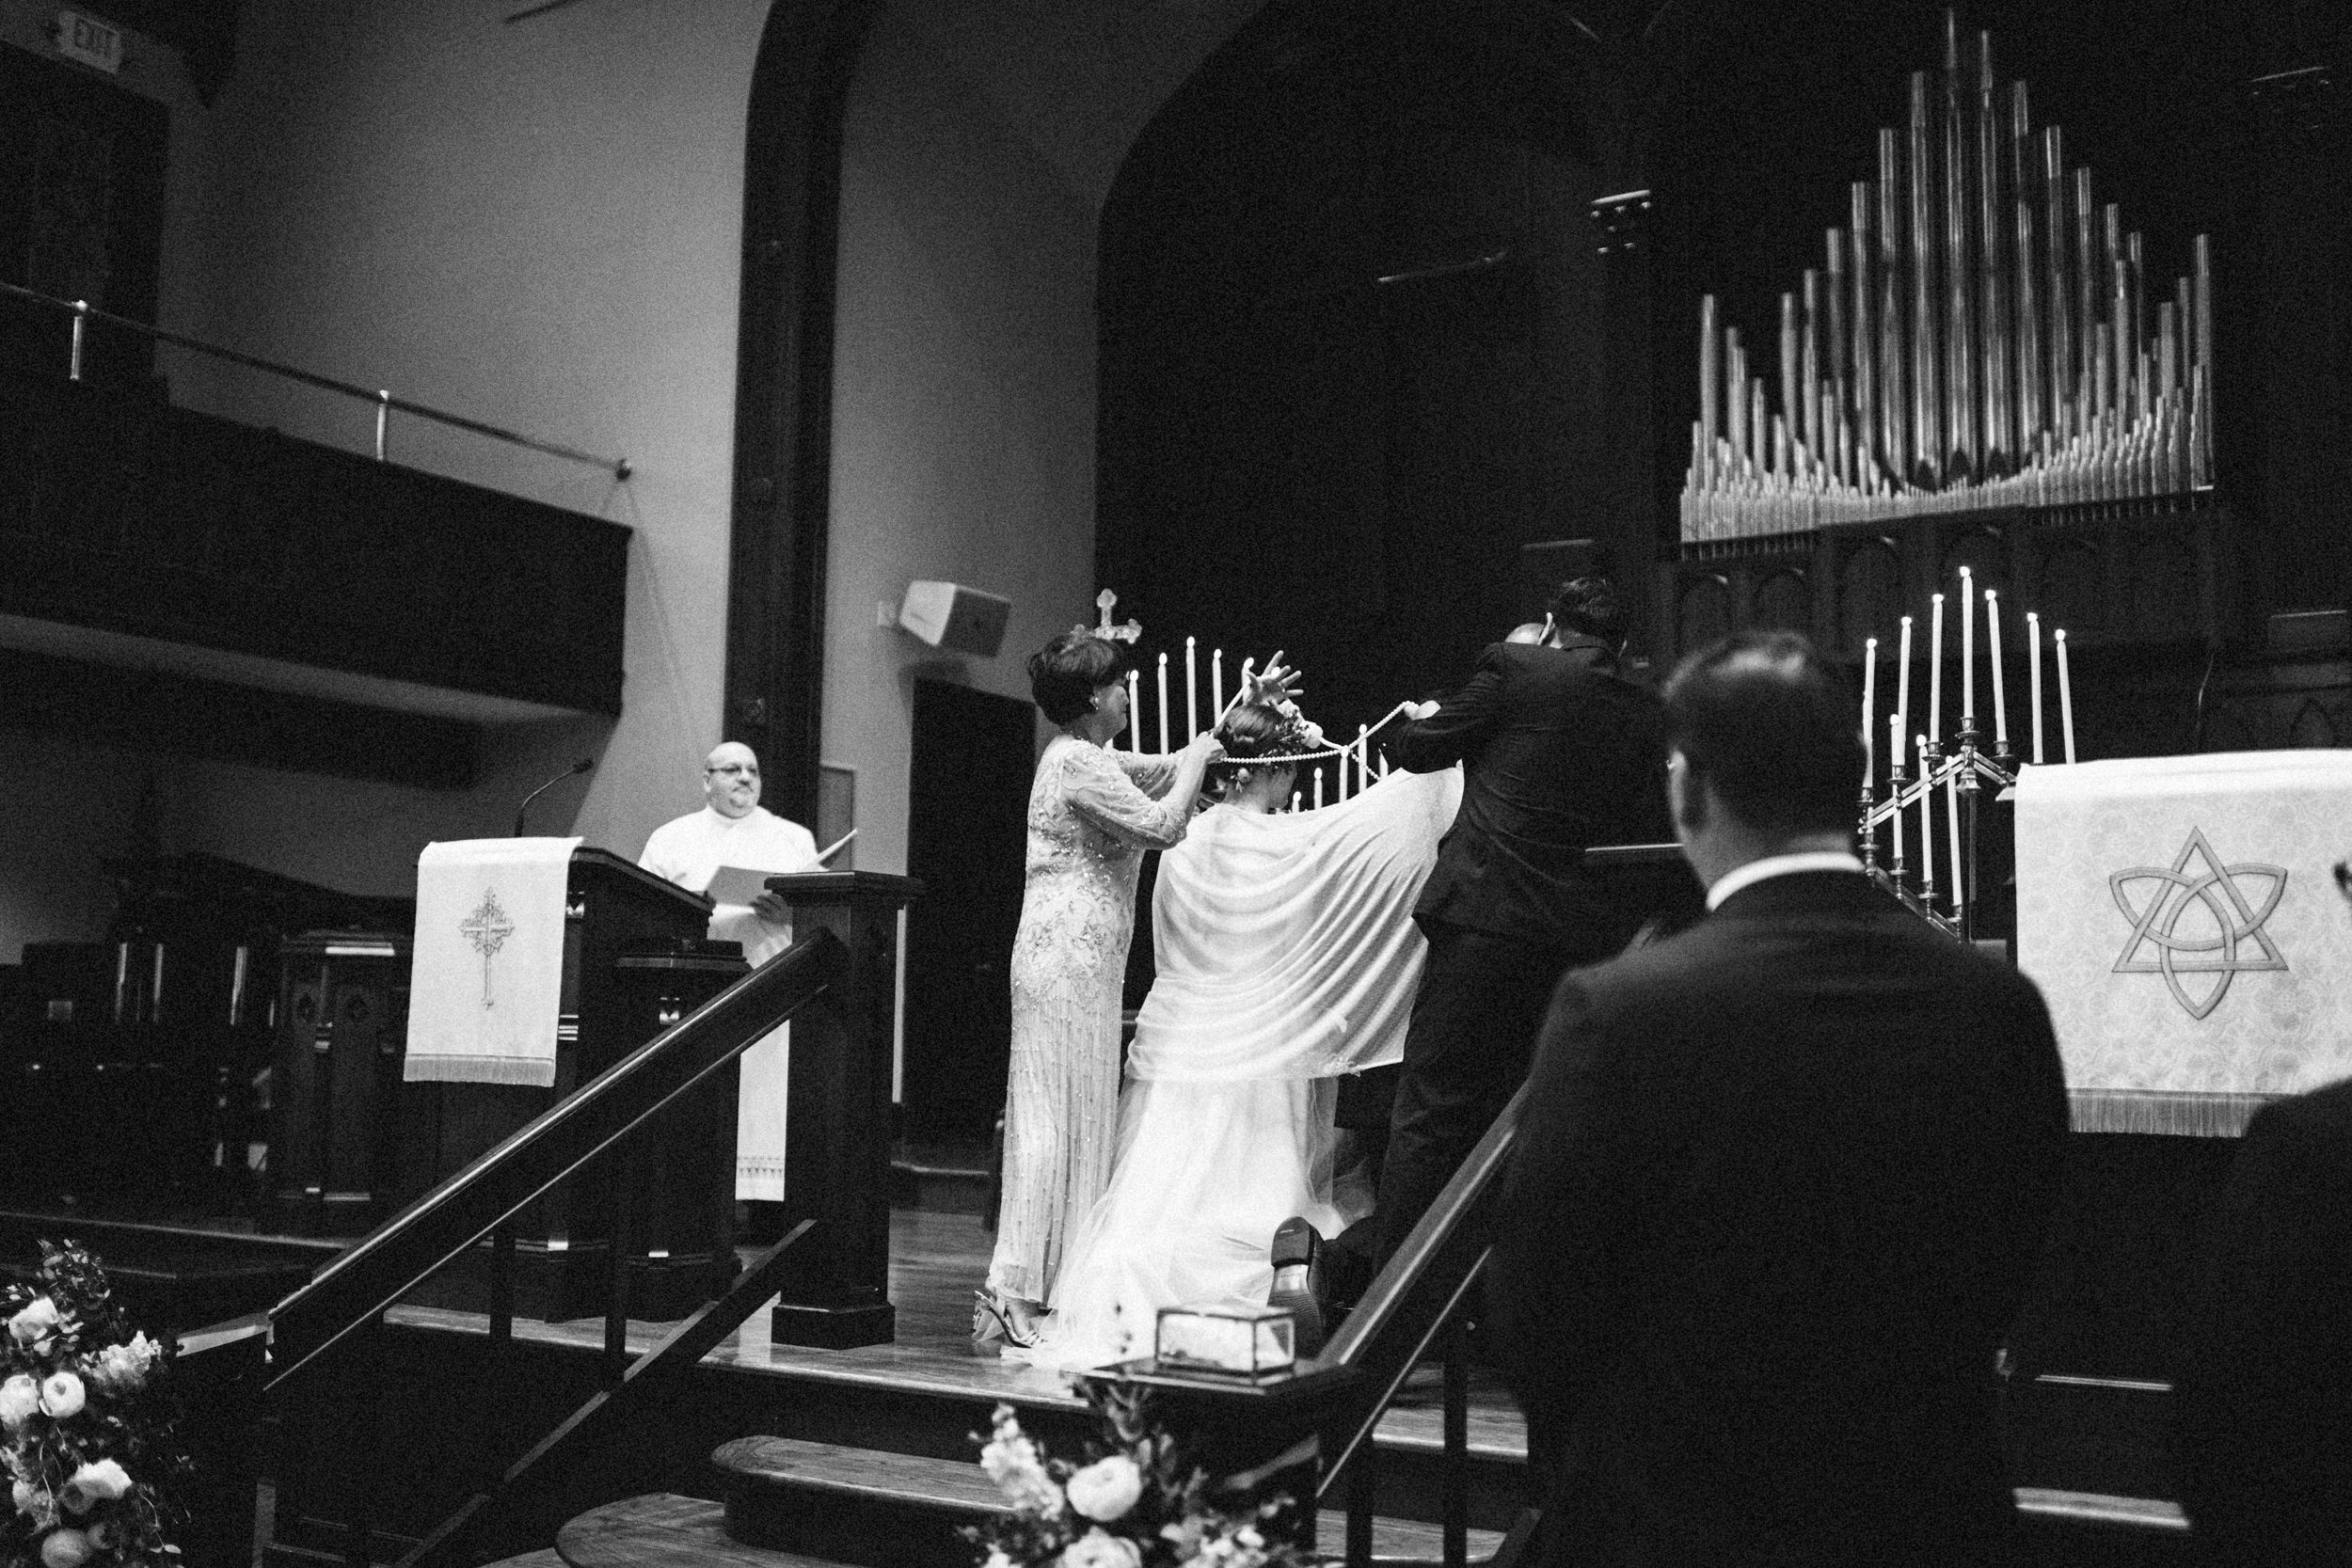 lauren-dean-wedding-grand-lodge-kentucky-sarah-katherine-davis-photography-374bw.jpg